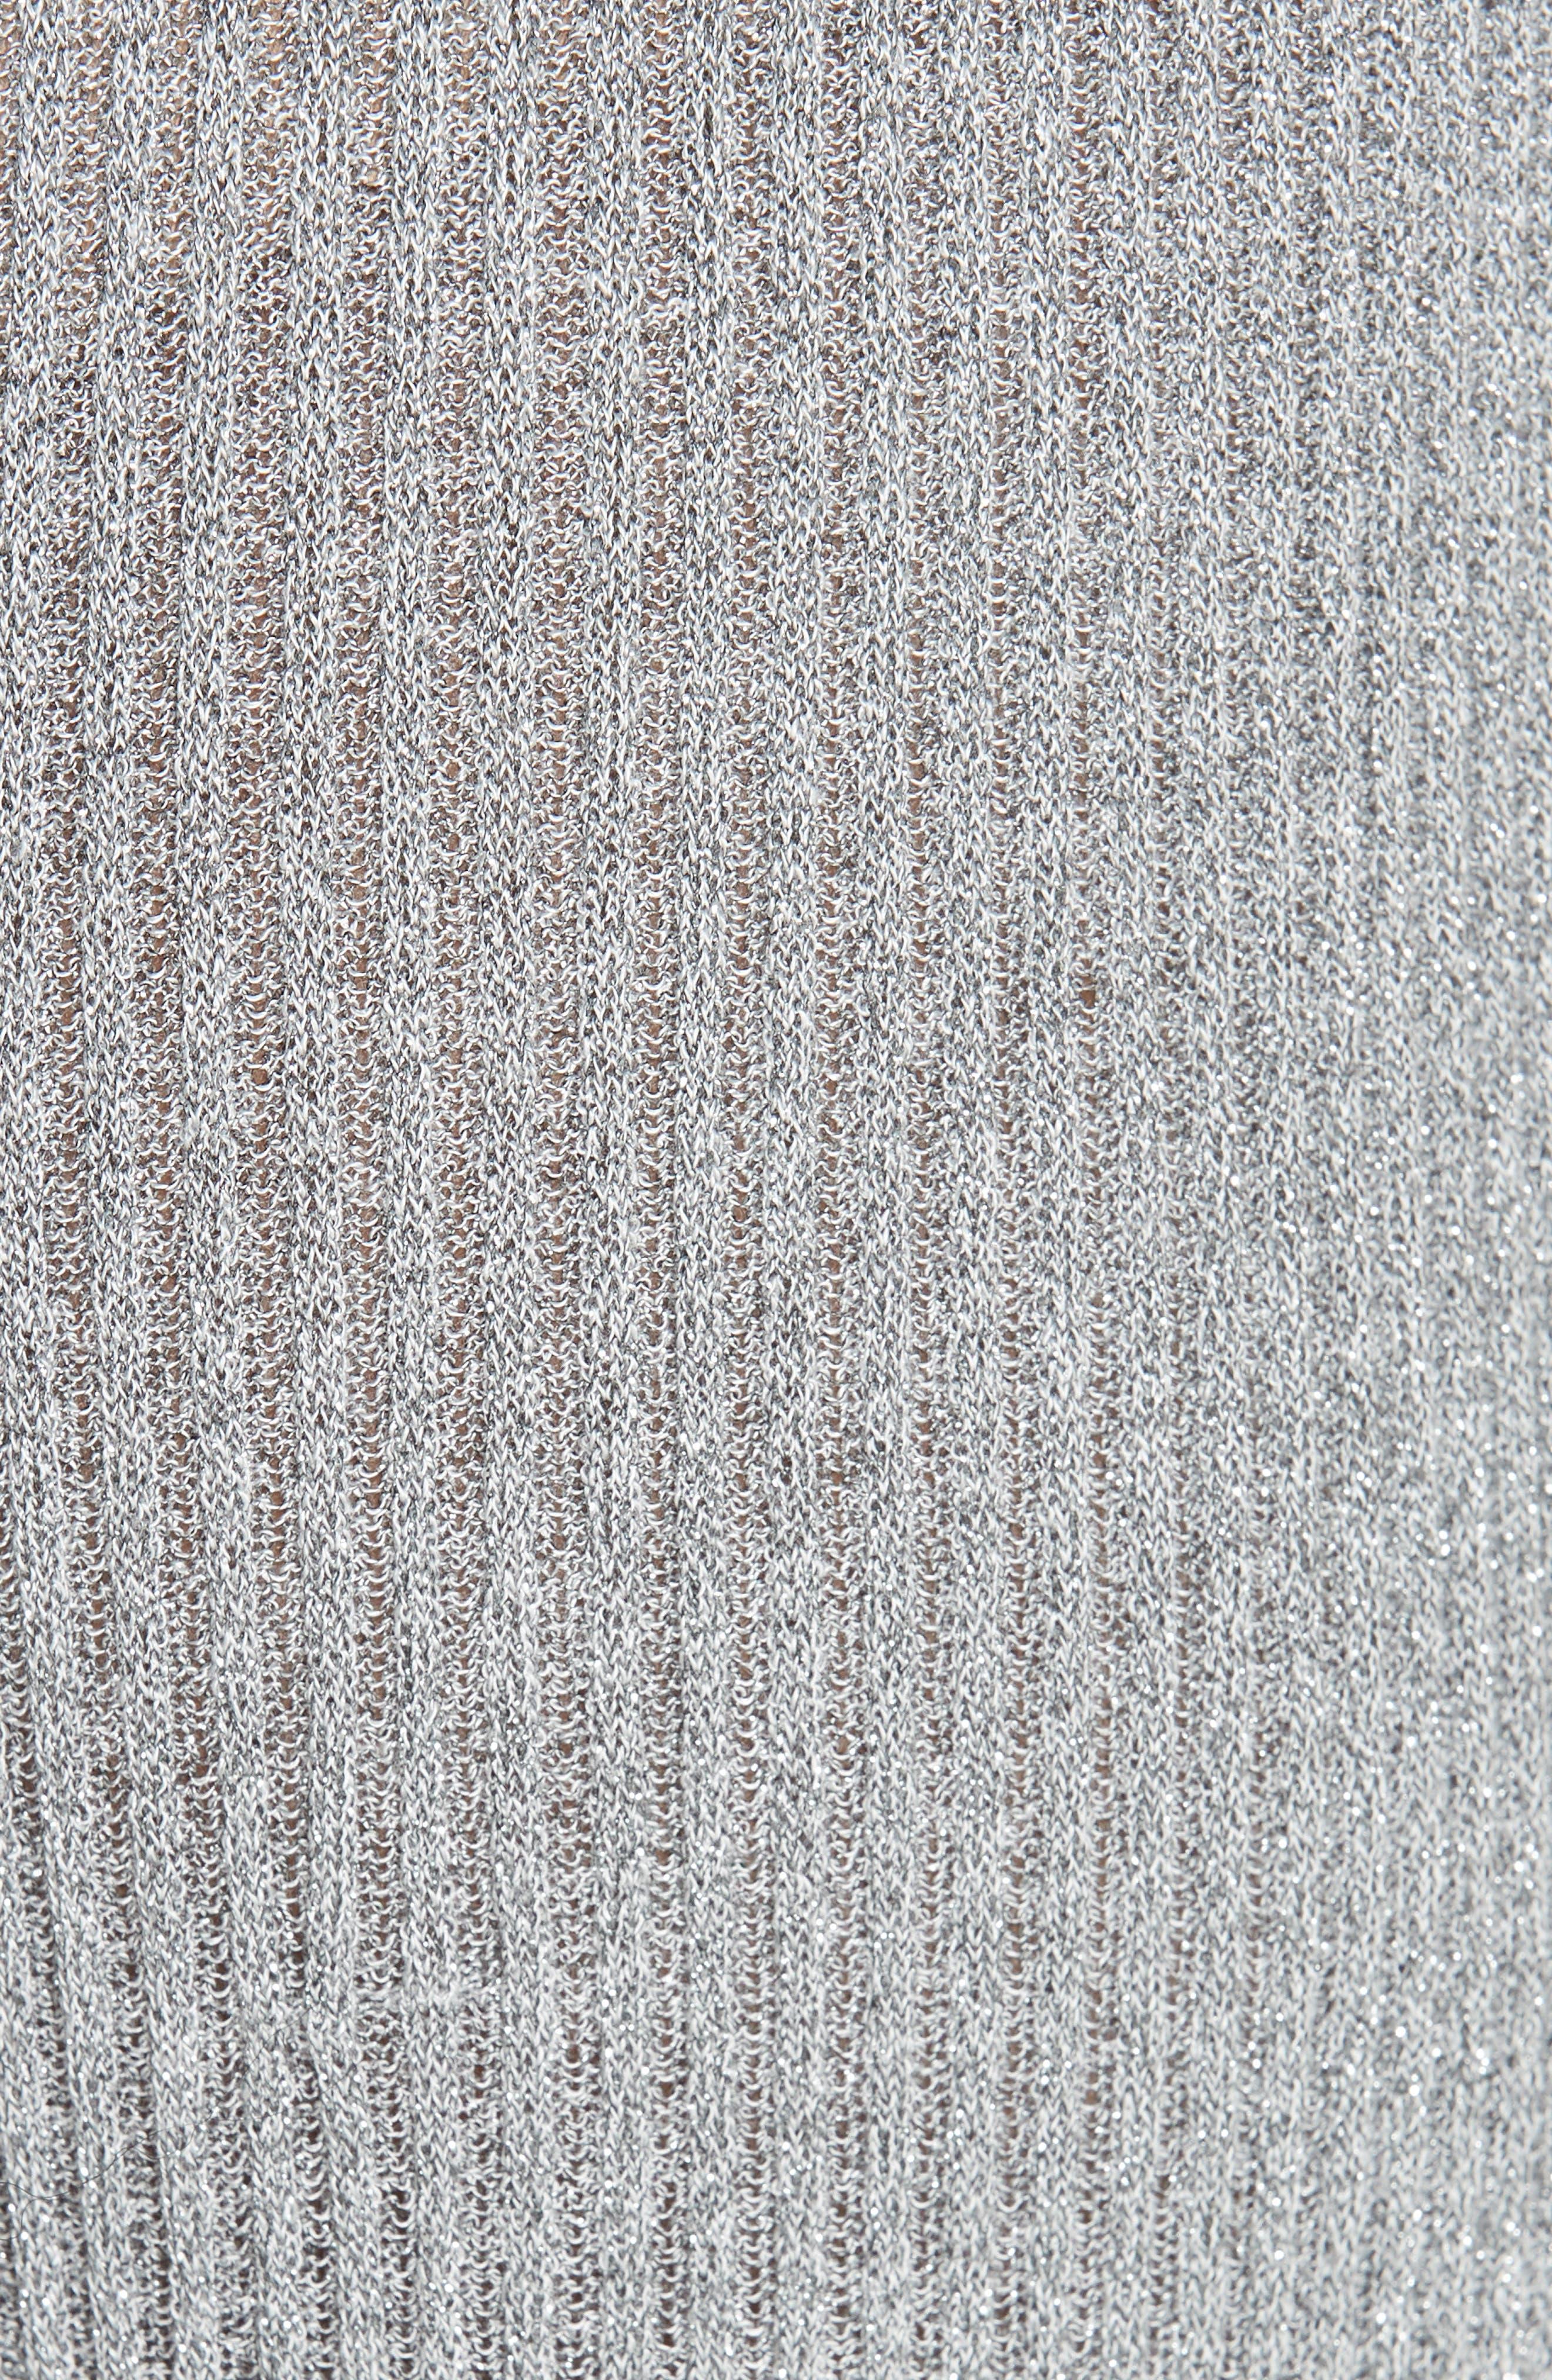 Mikhaela Knit Pants,                             Alternate thumbnail 5, color,                             SILVER